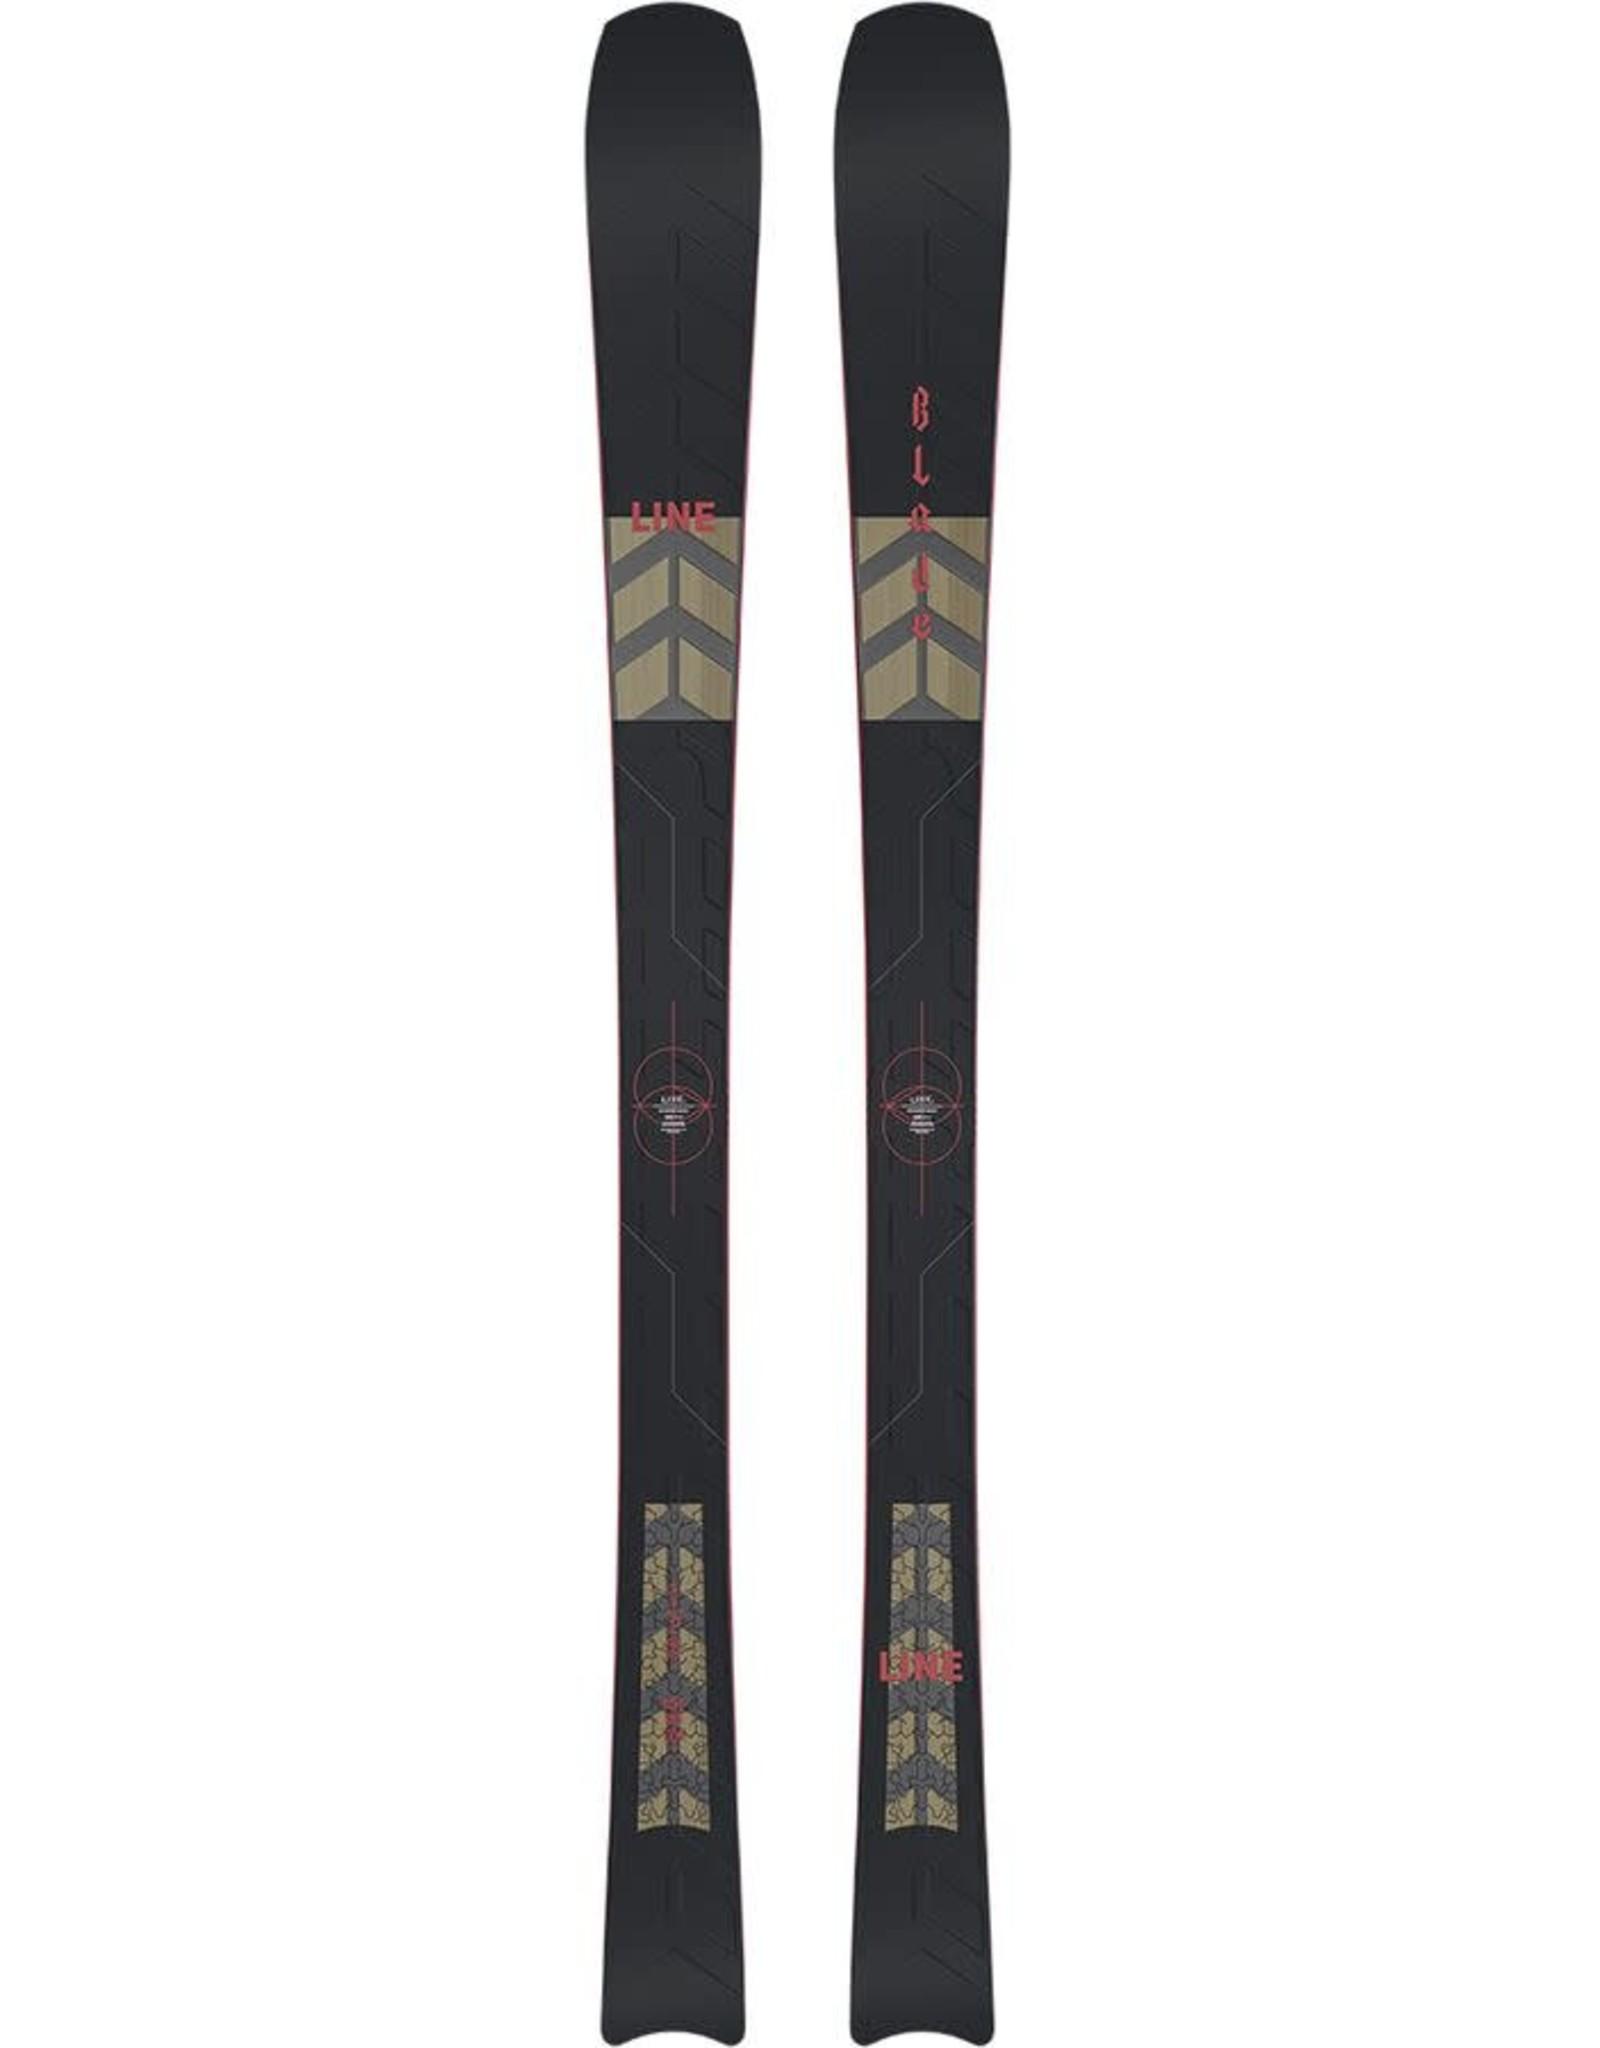 LINE Skis LINE Skis BLADE (20/21)